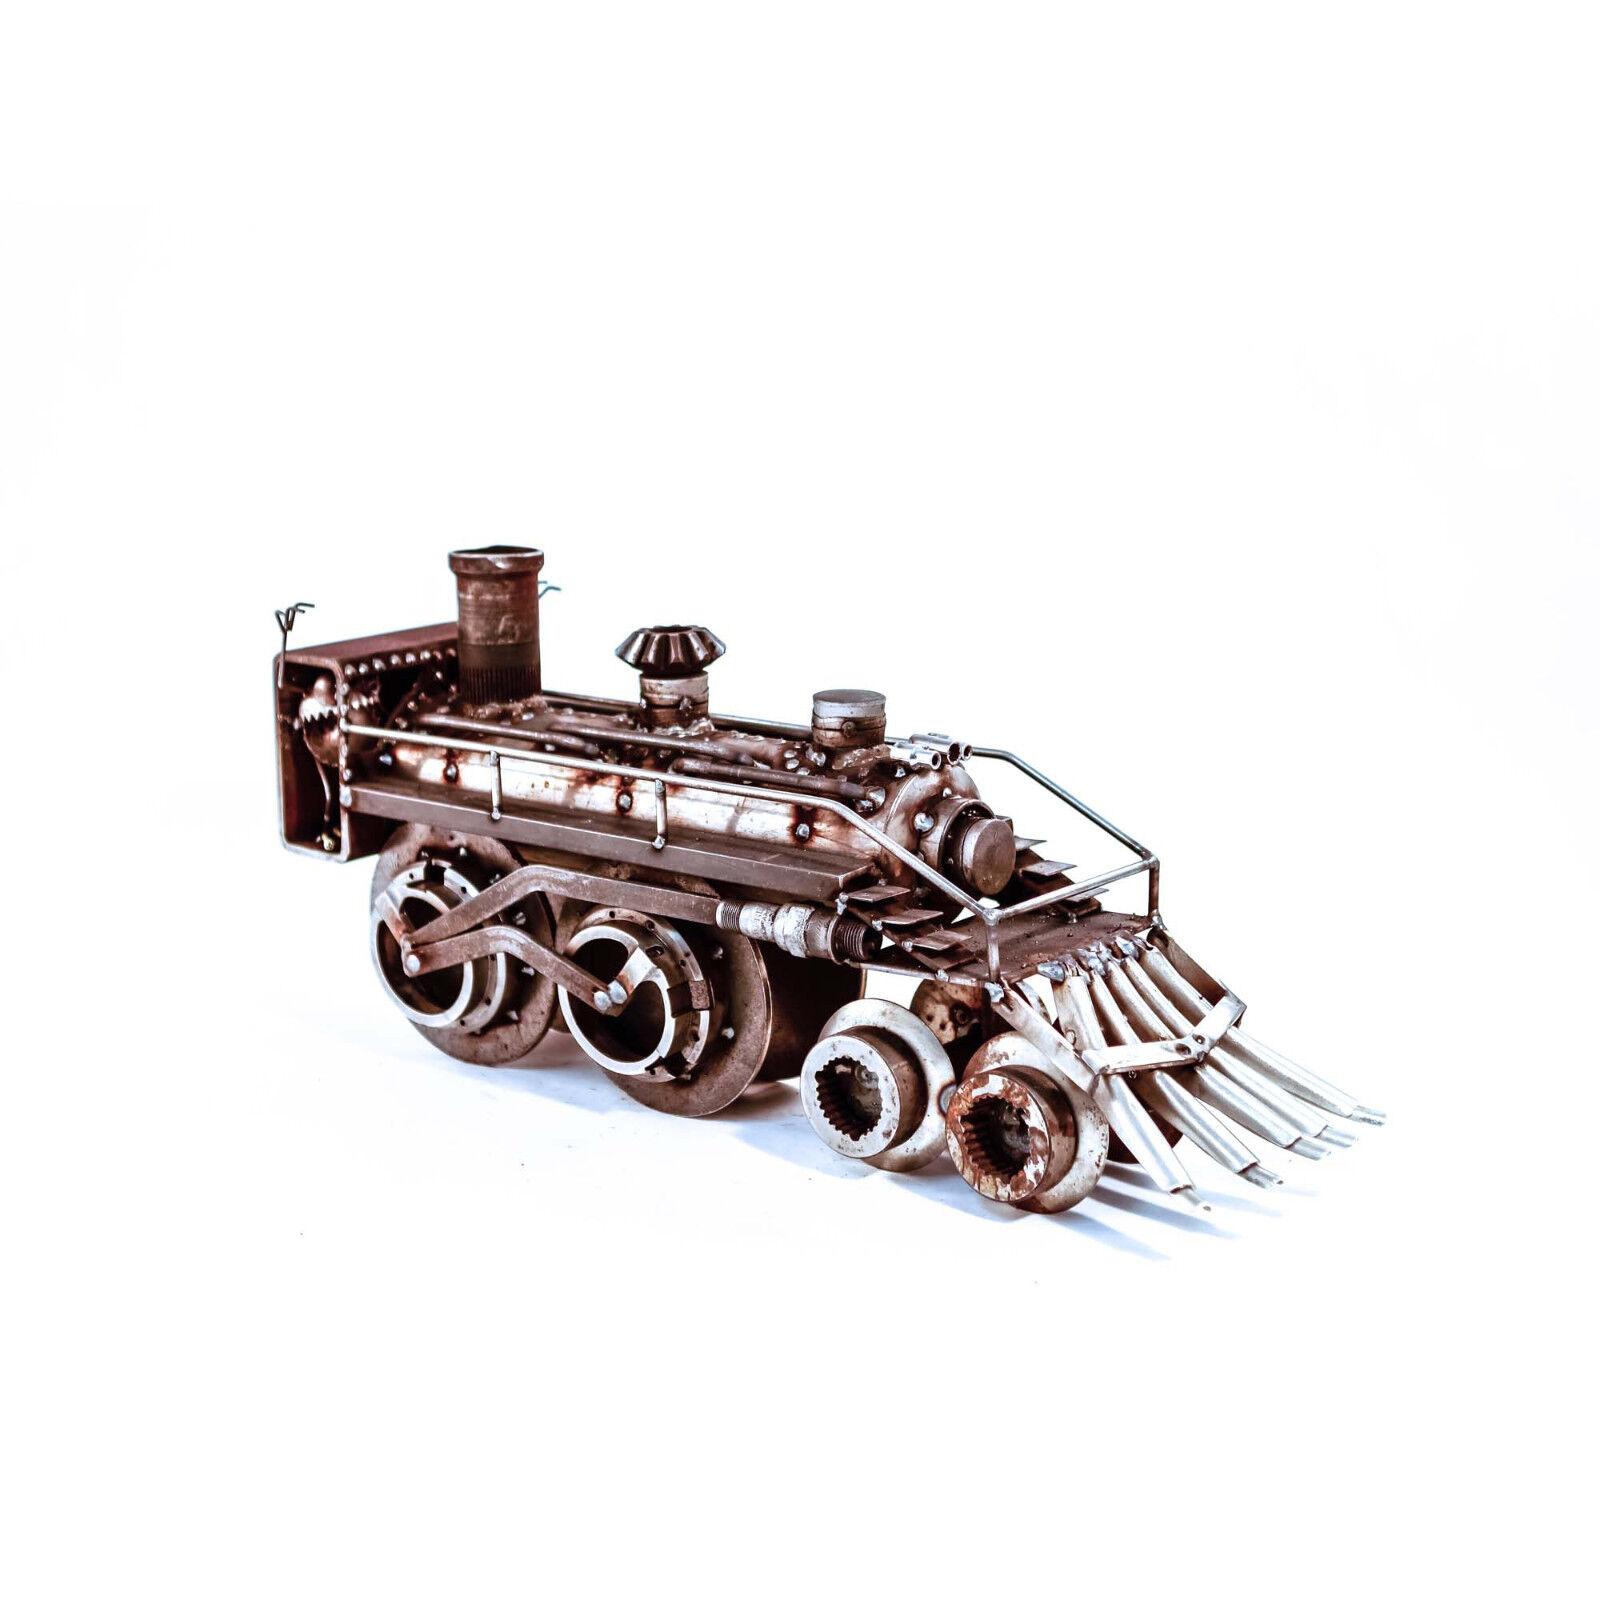 Sugarpost Scrap Metal Art Gnome Be Gone Crazy Train Metal Sculpture Item  1090